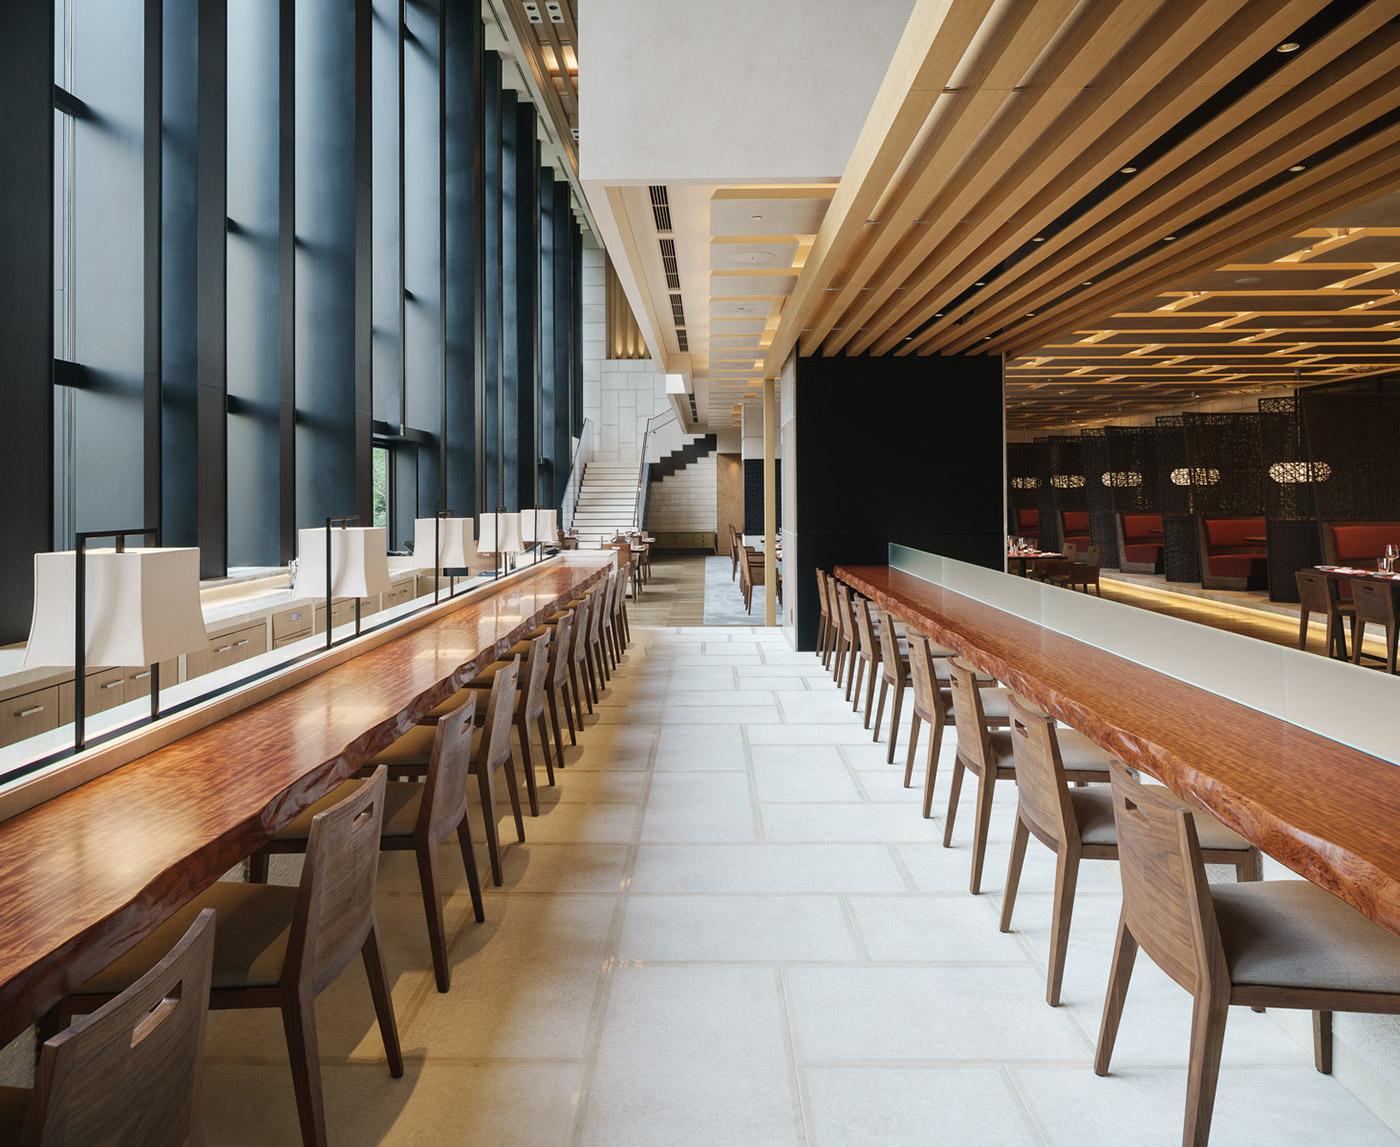 Brasserie in four seasons hotel kyoto kokaistudios on for Design hotel kyoto